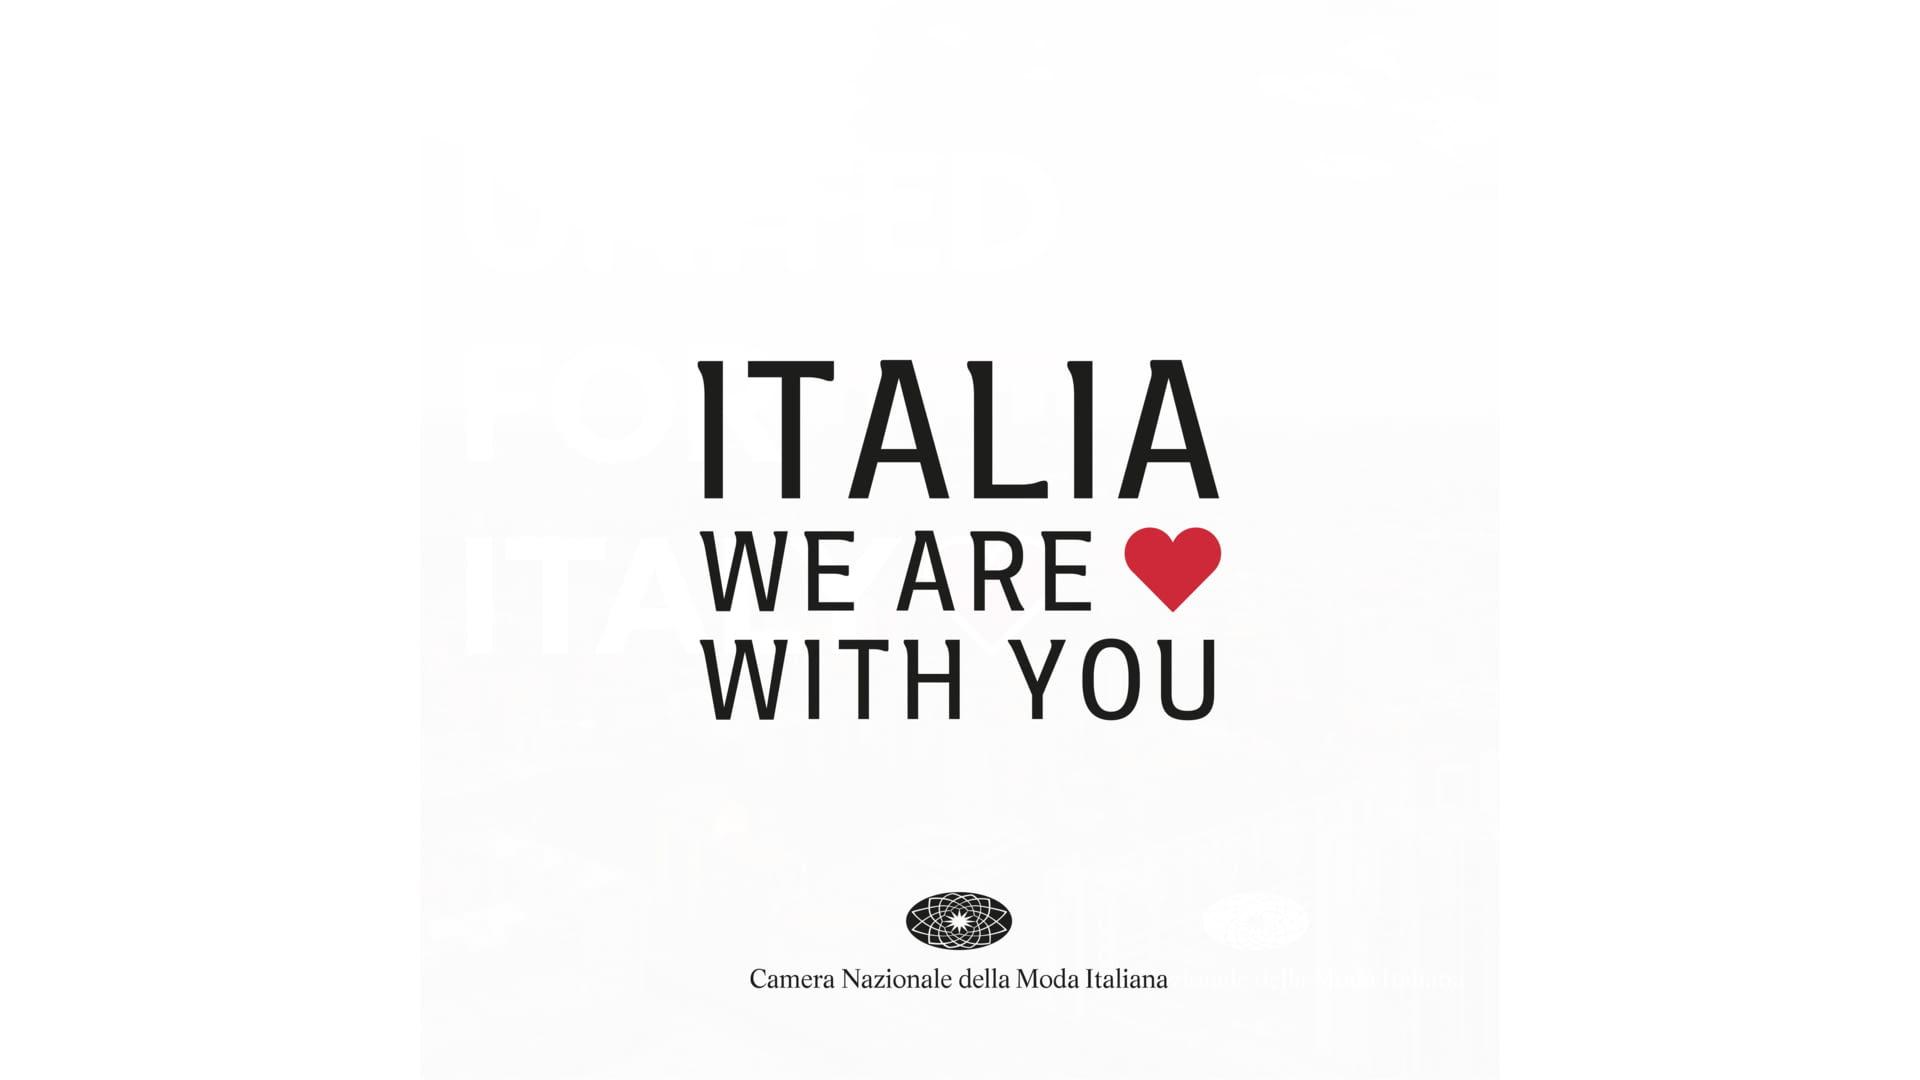 CNMI - Italia we are with you